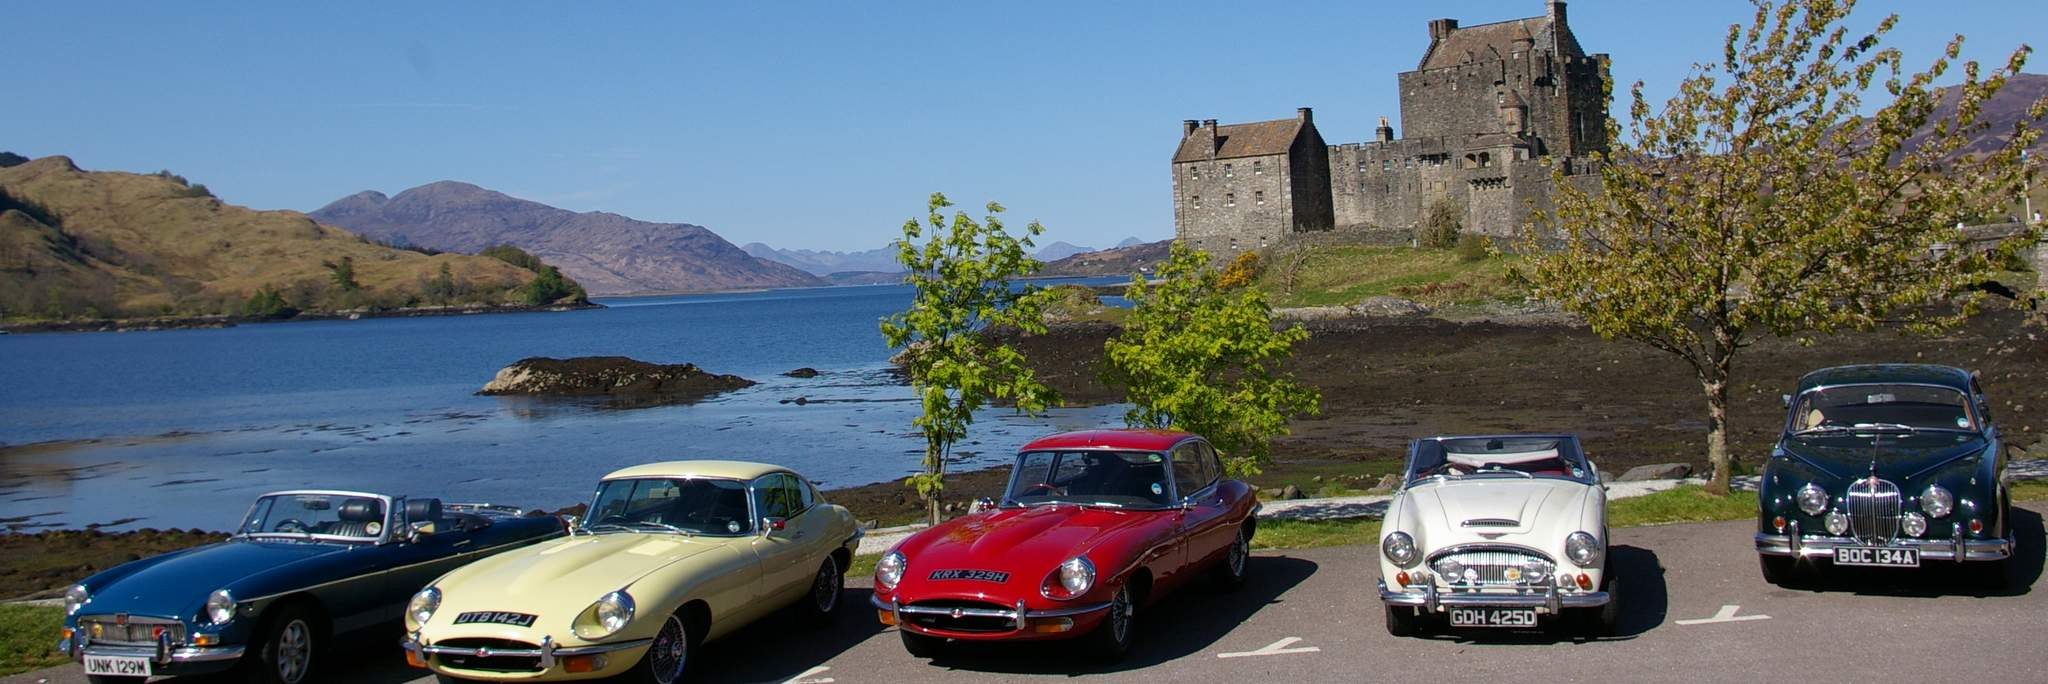 Discover Scotland by Car